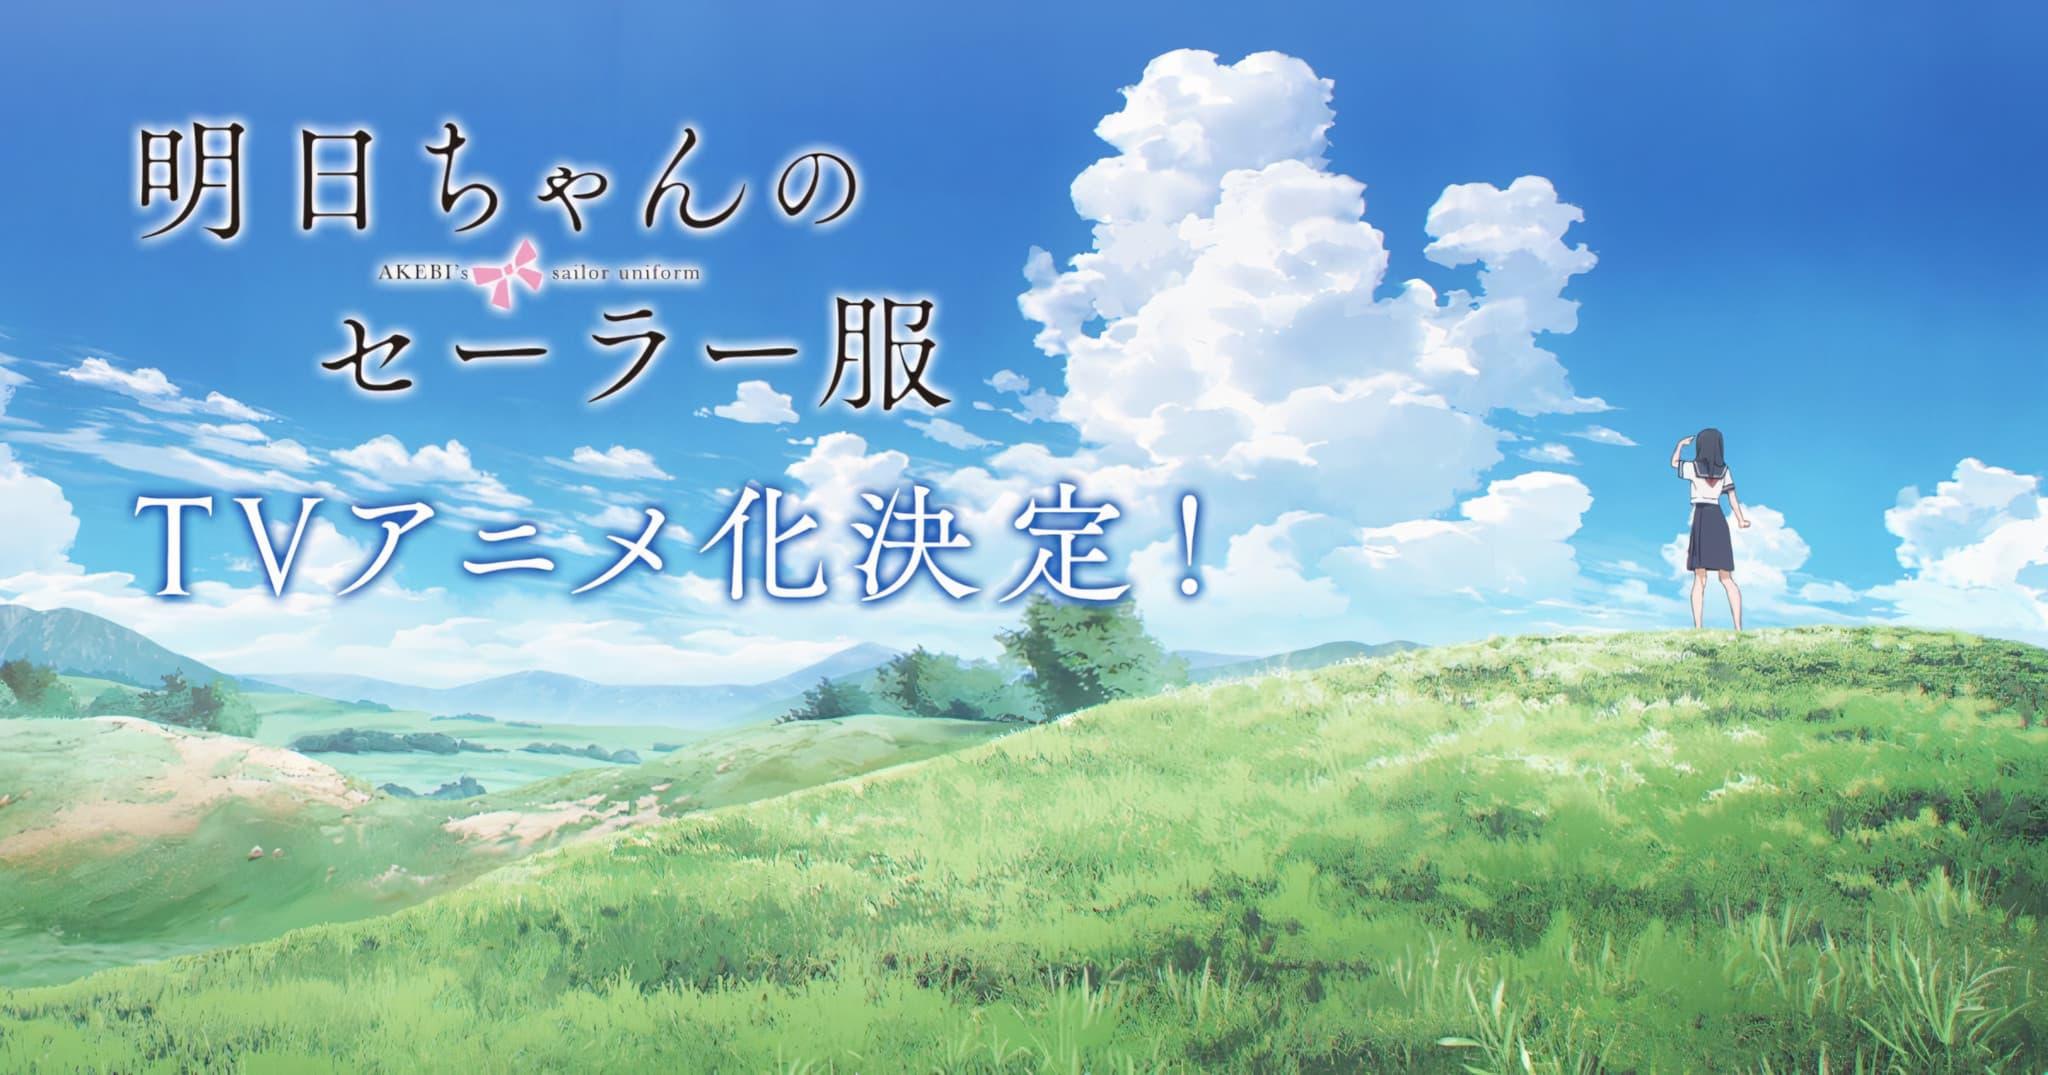 Akebi's Sailor Uniform manga laves til TV anime